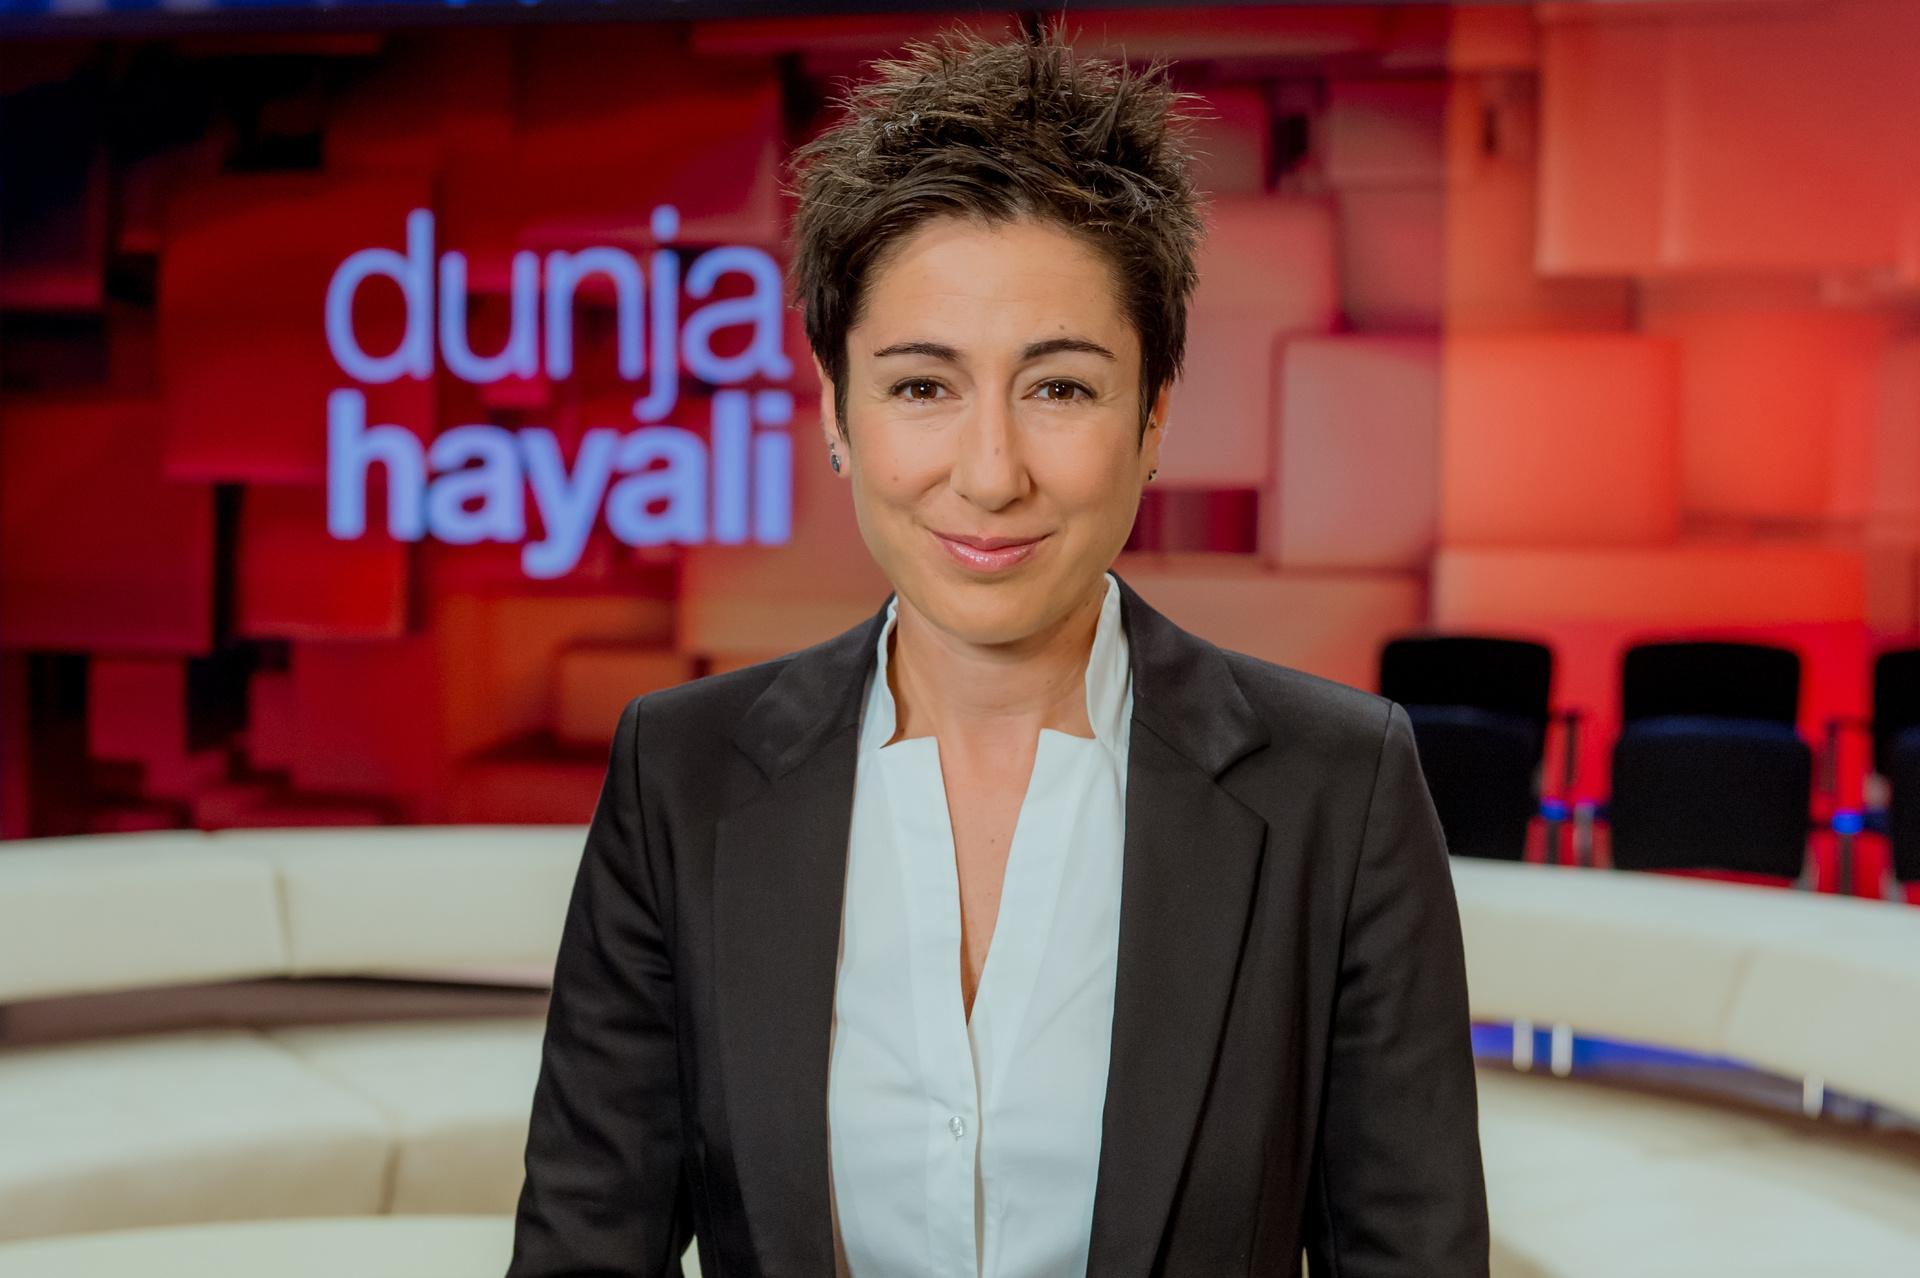 """Dunja Hayali"" heute Abend im ZDF"